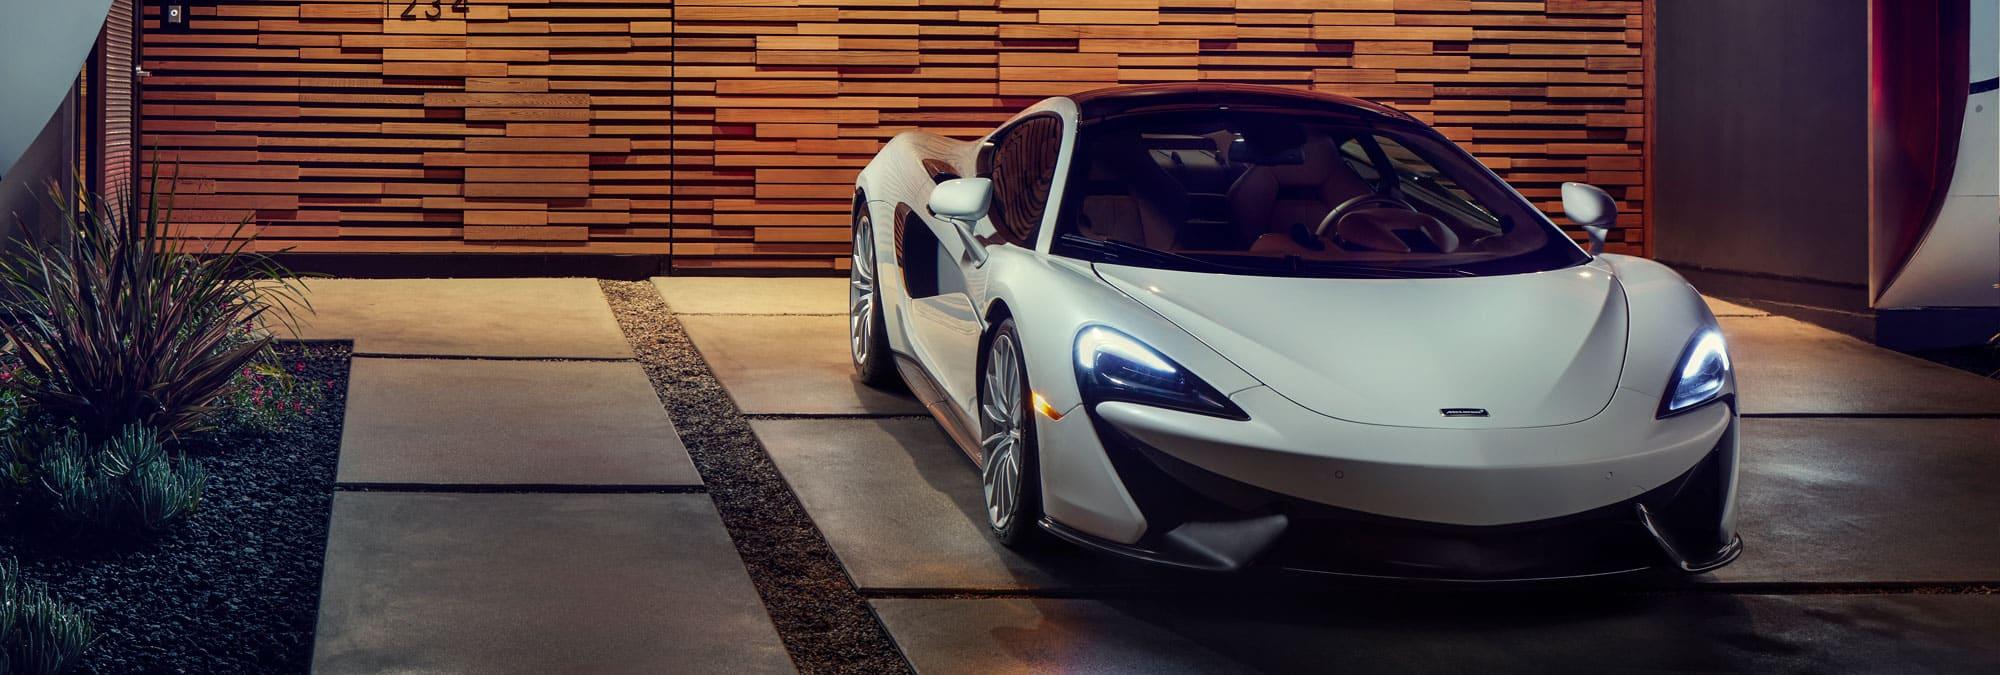 mclaren-570gt-white-for-sale-front-hero